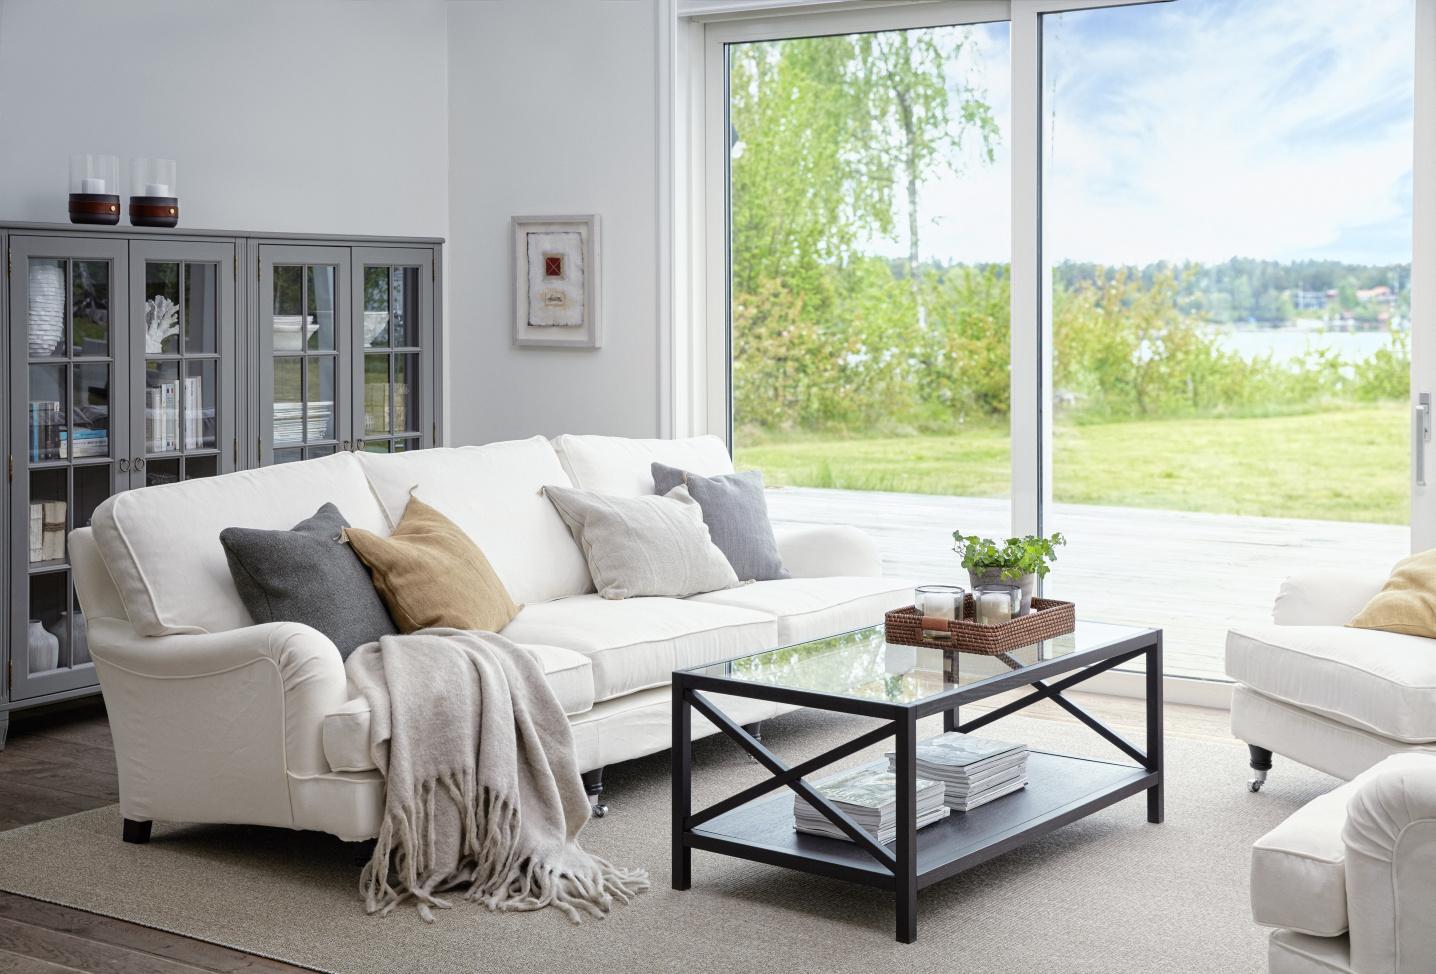 Store Englesson Möbler i klassisk elegant stil med vackra detaljer